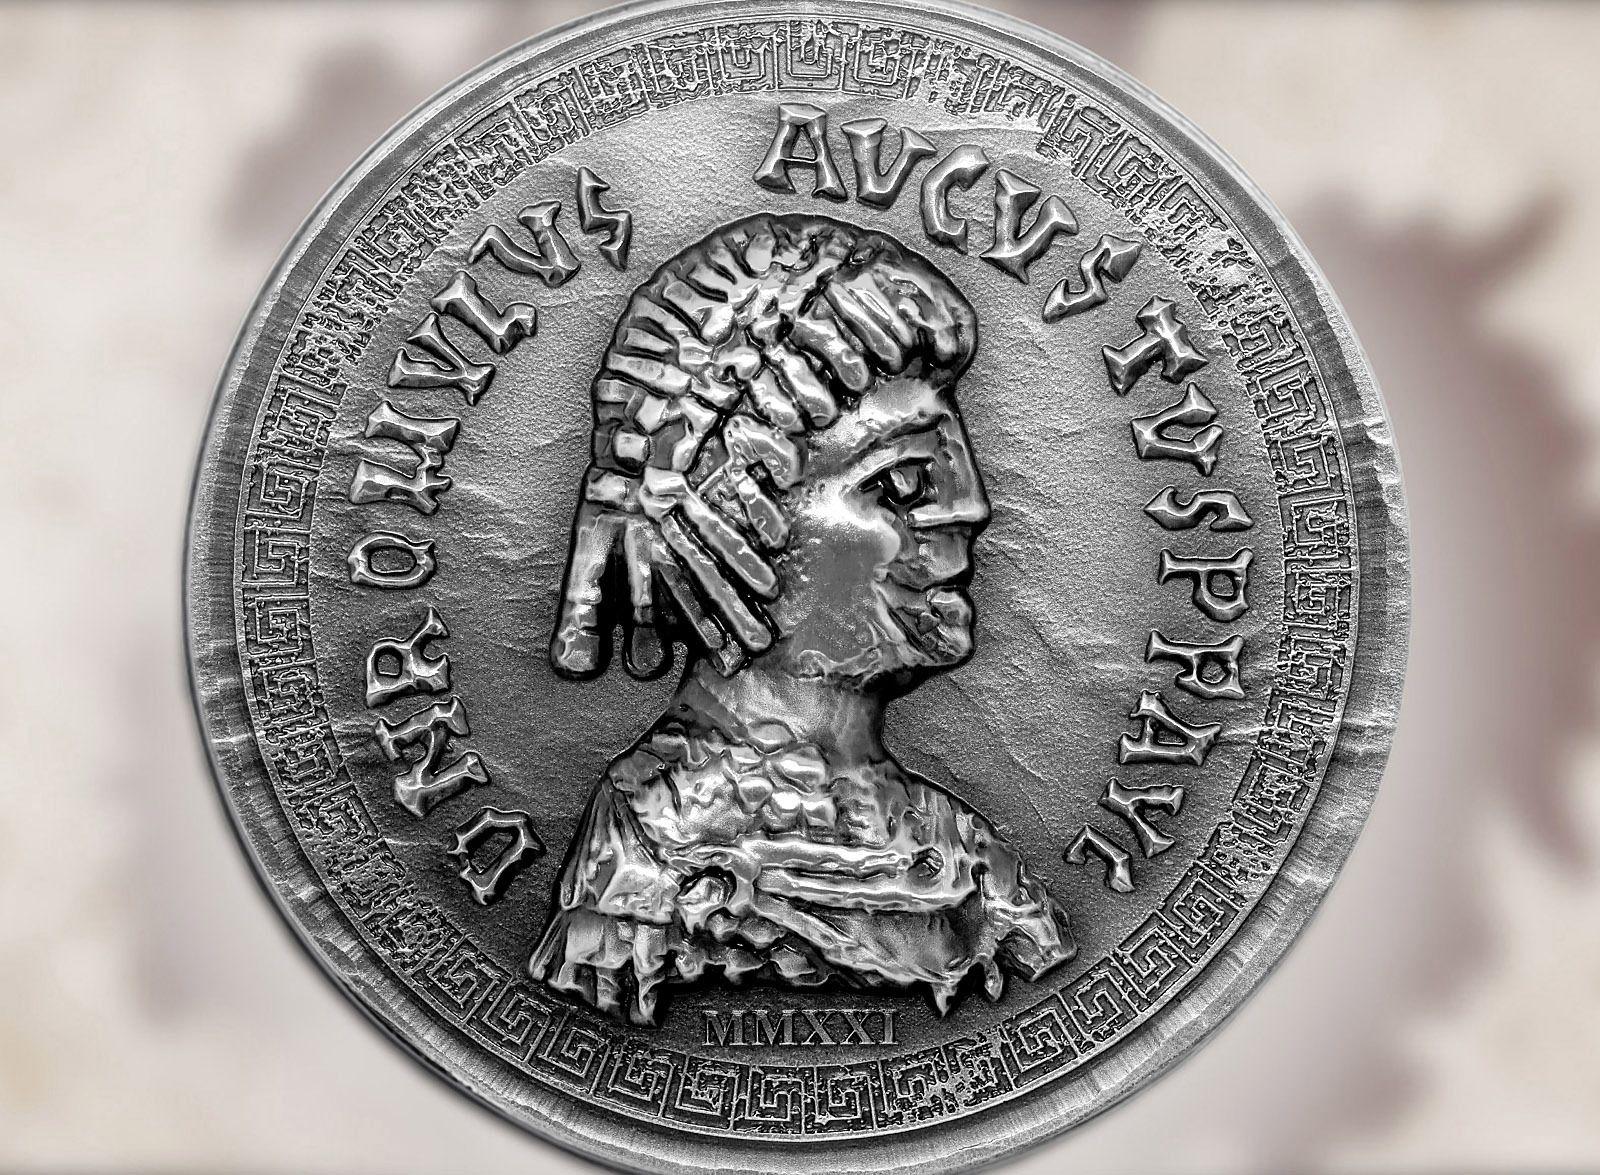 Roman Empire Romulus Augustulus 1oz Silver Coin